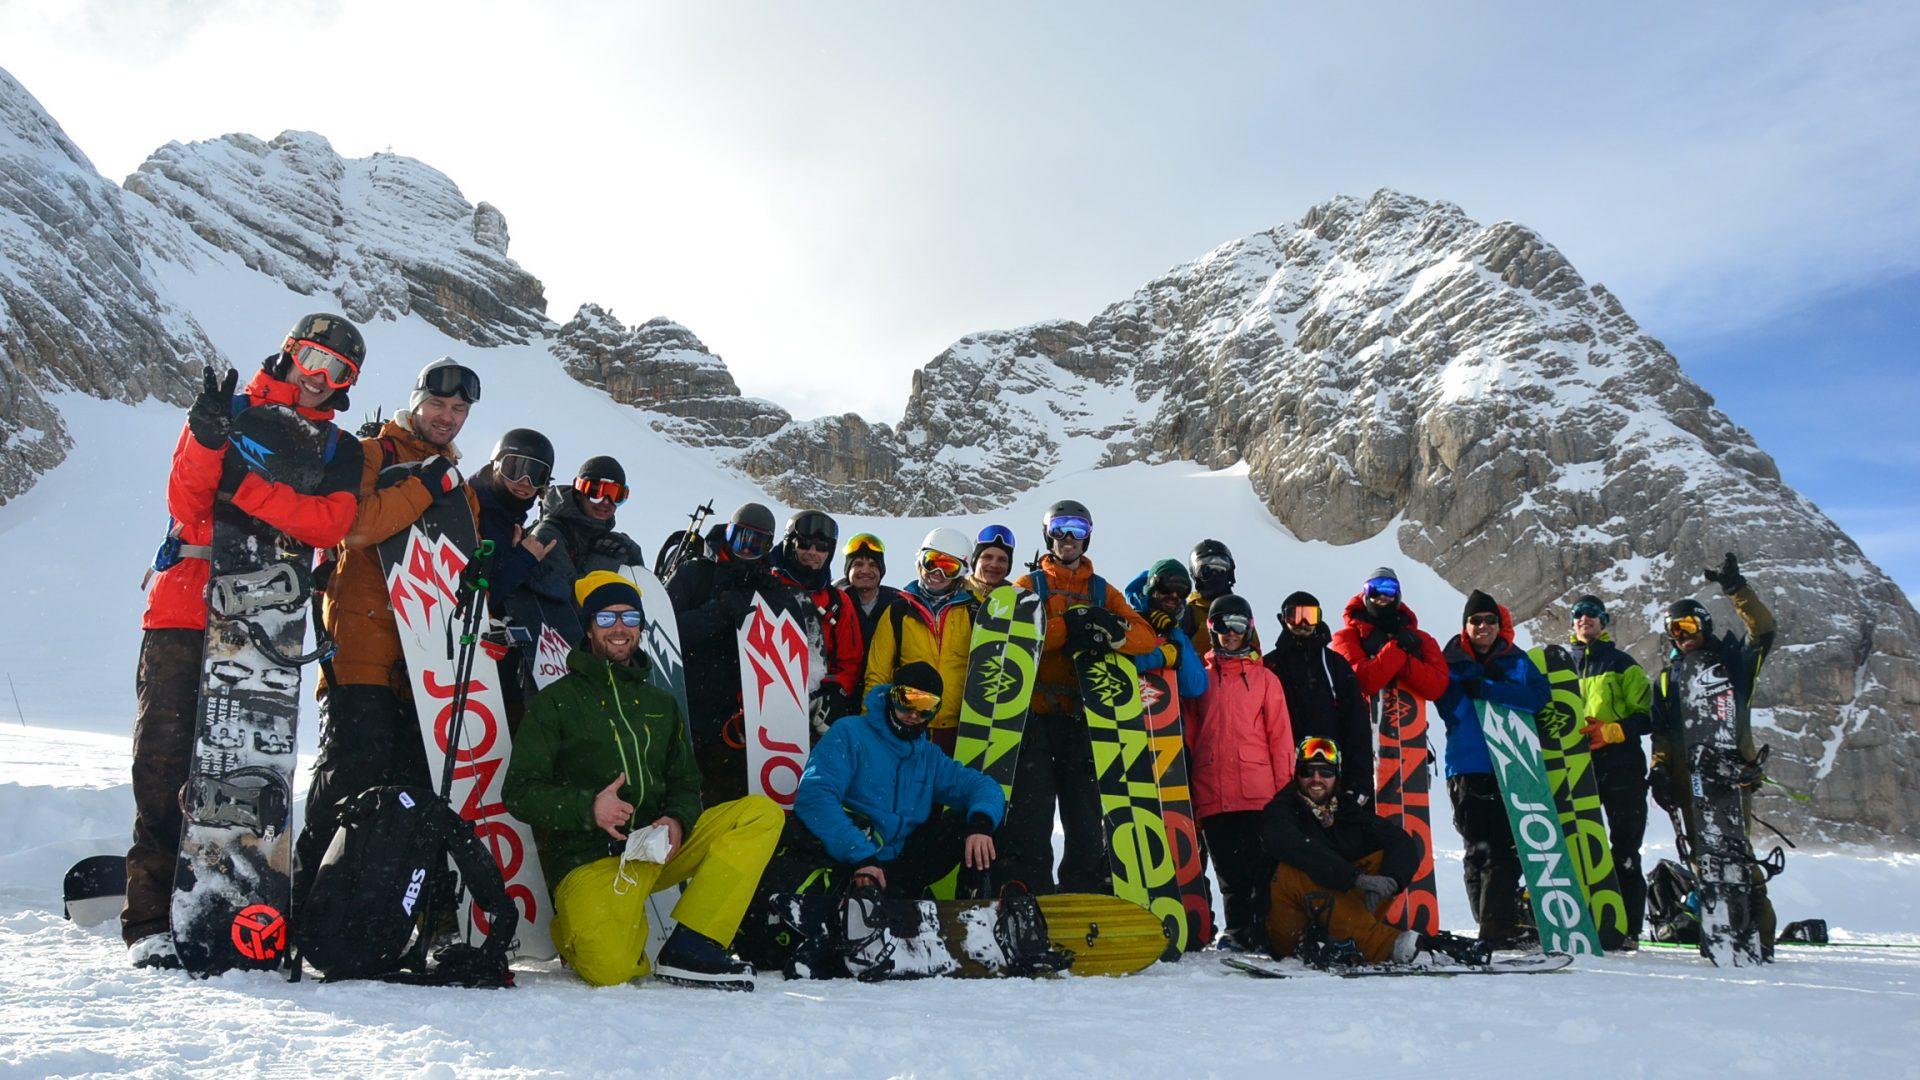 Group Shots   photo by Bernhard Altmanninger